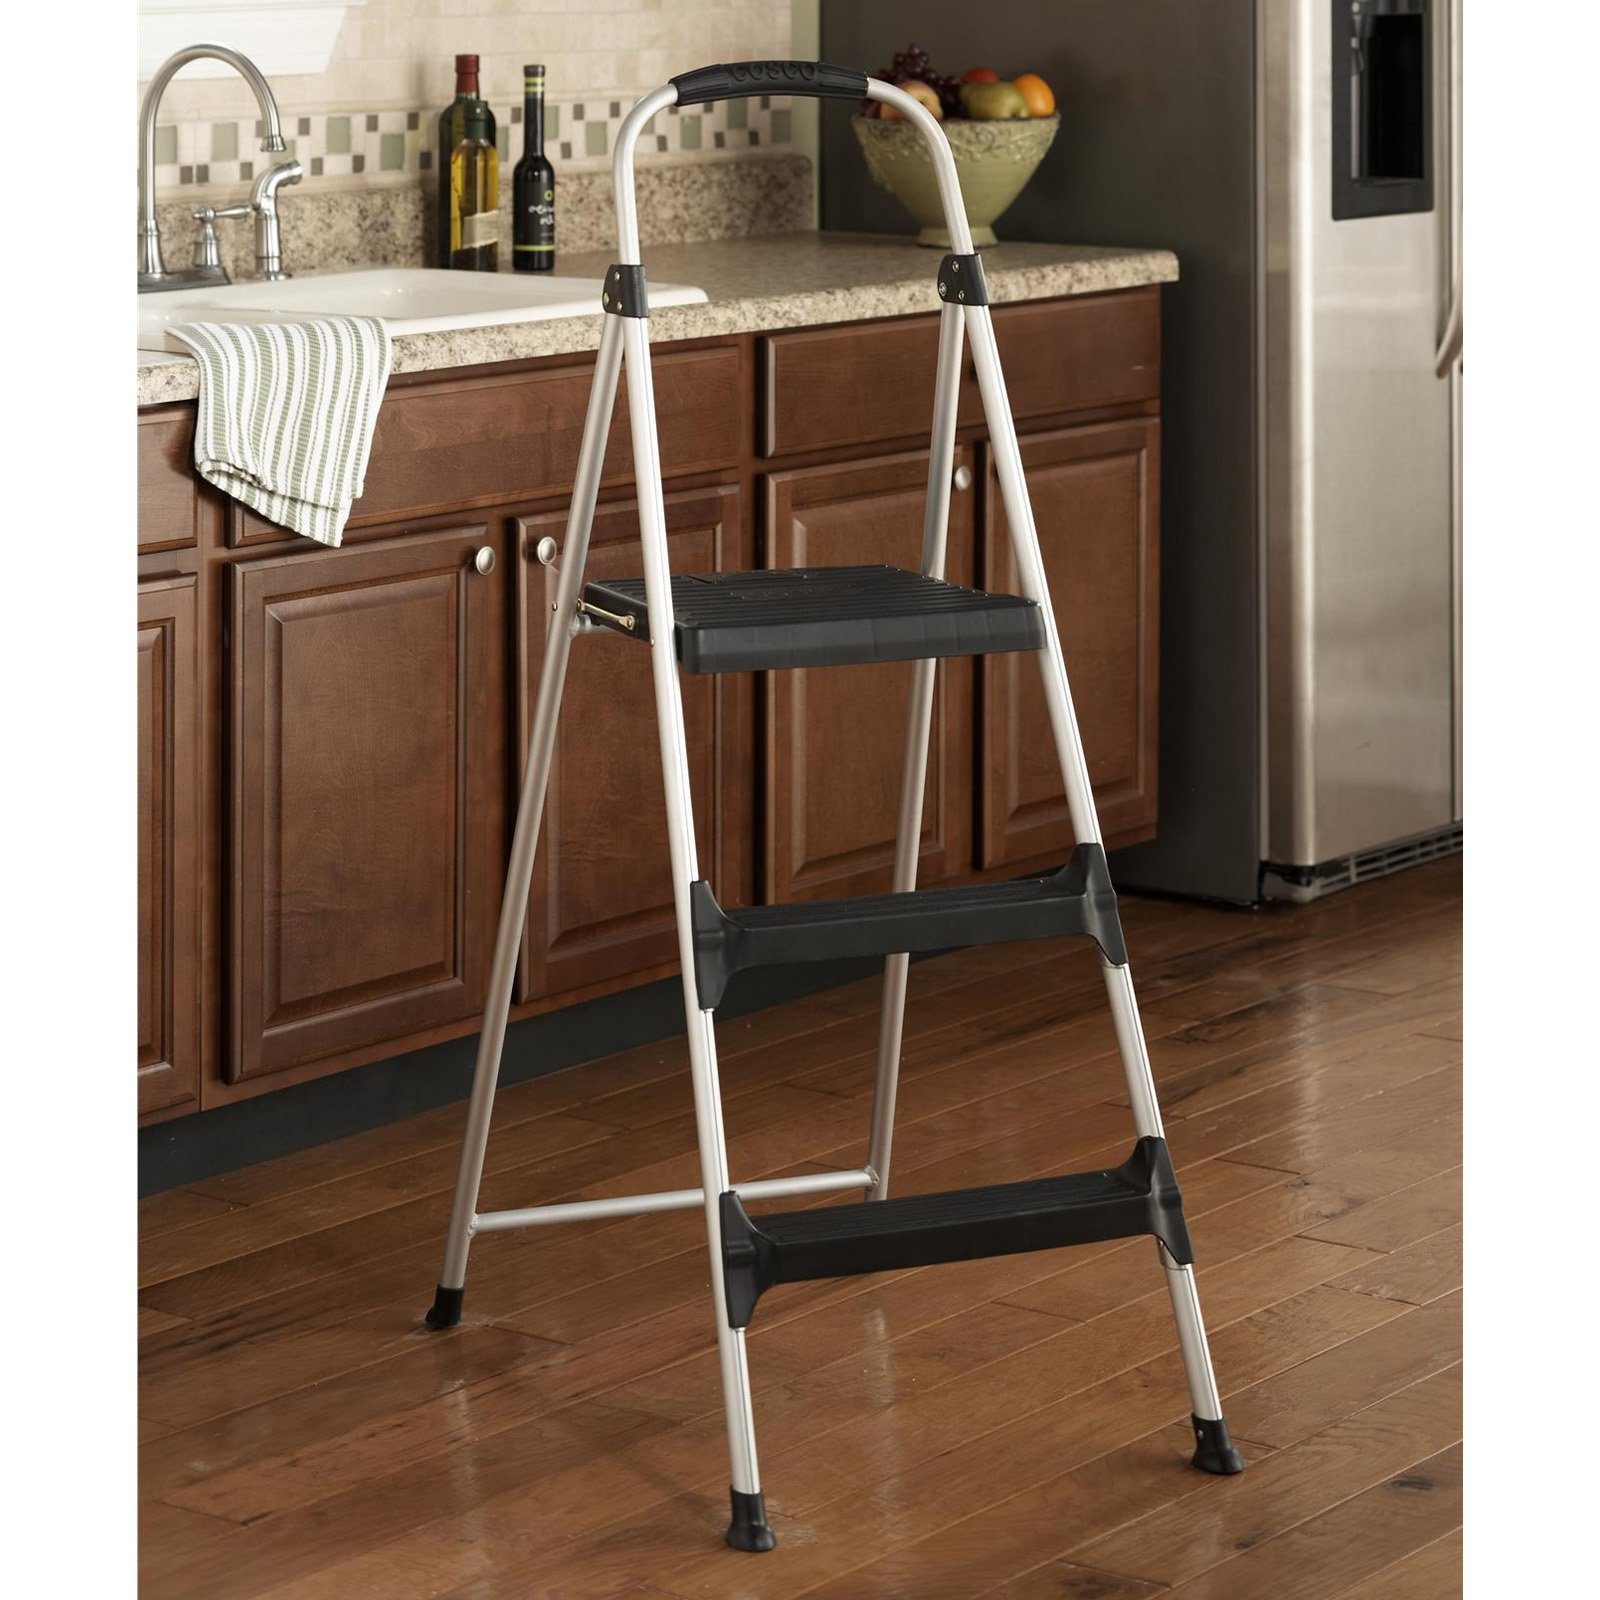 Cosco 3 Step Folding Step Stool With Handle Grip Walmart Com